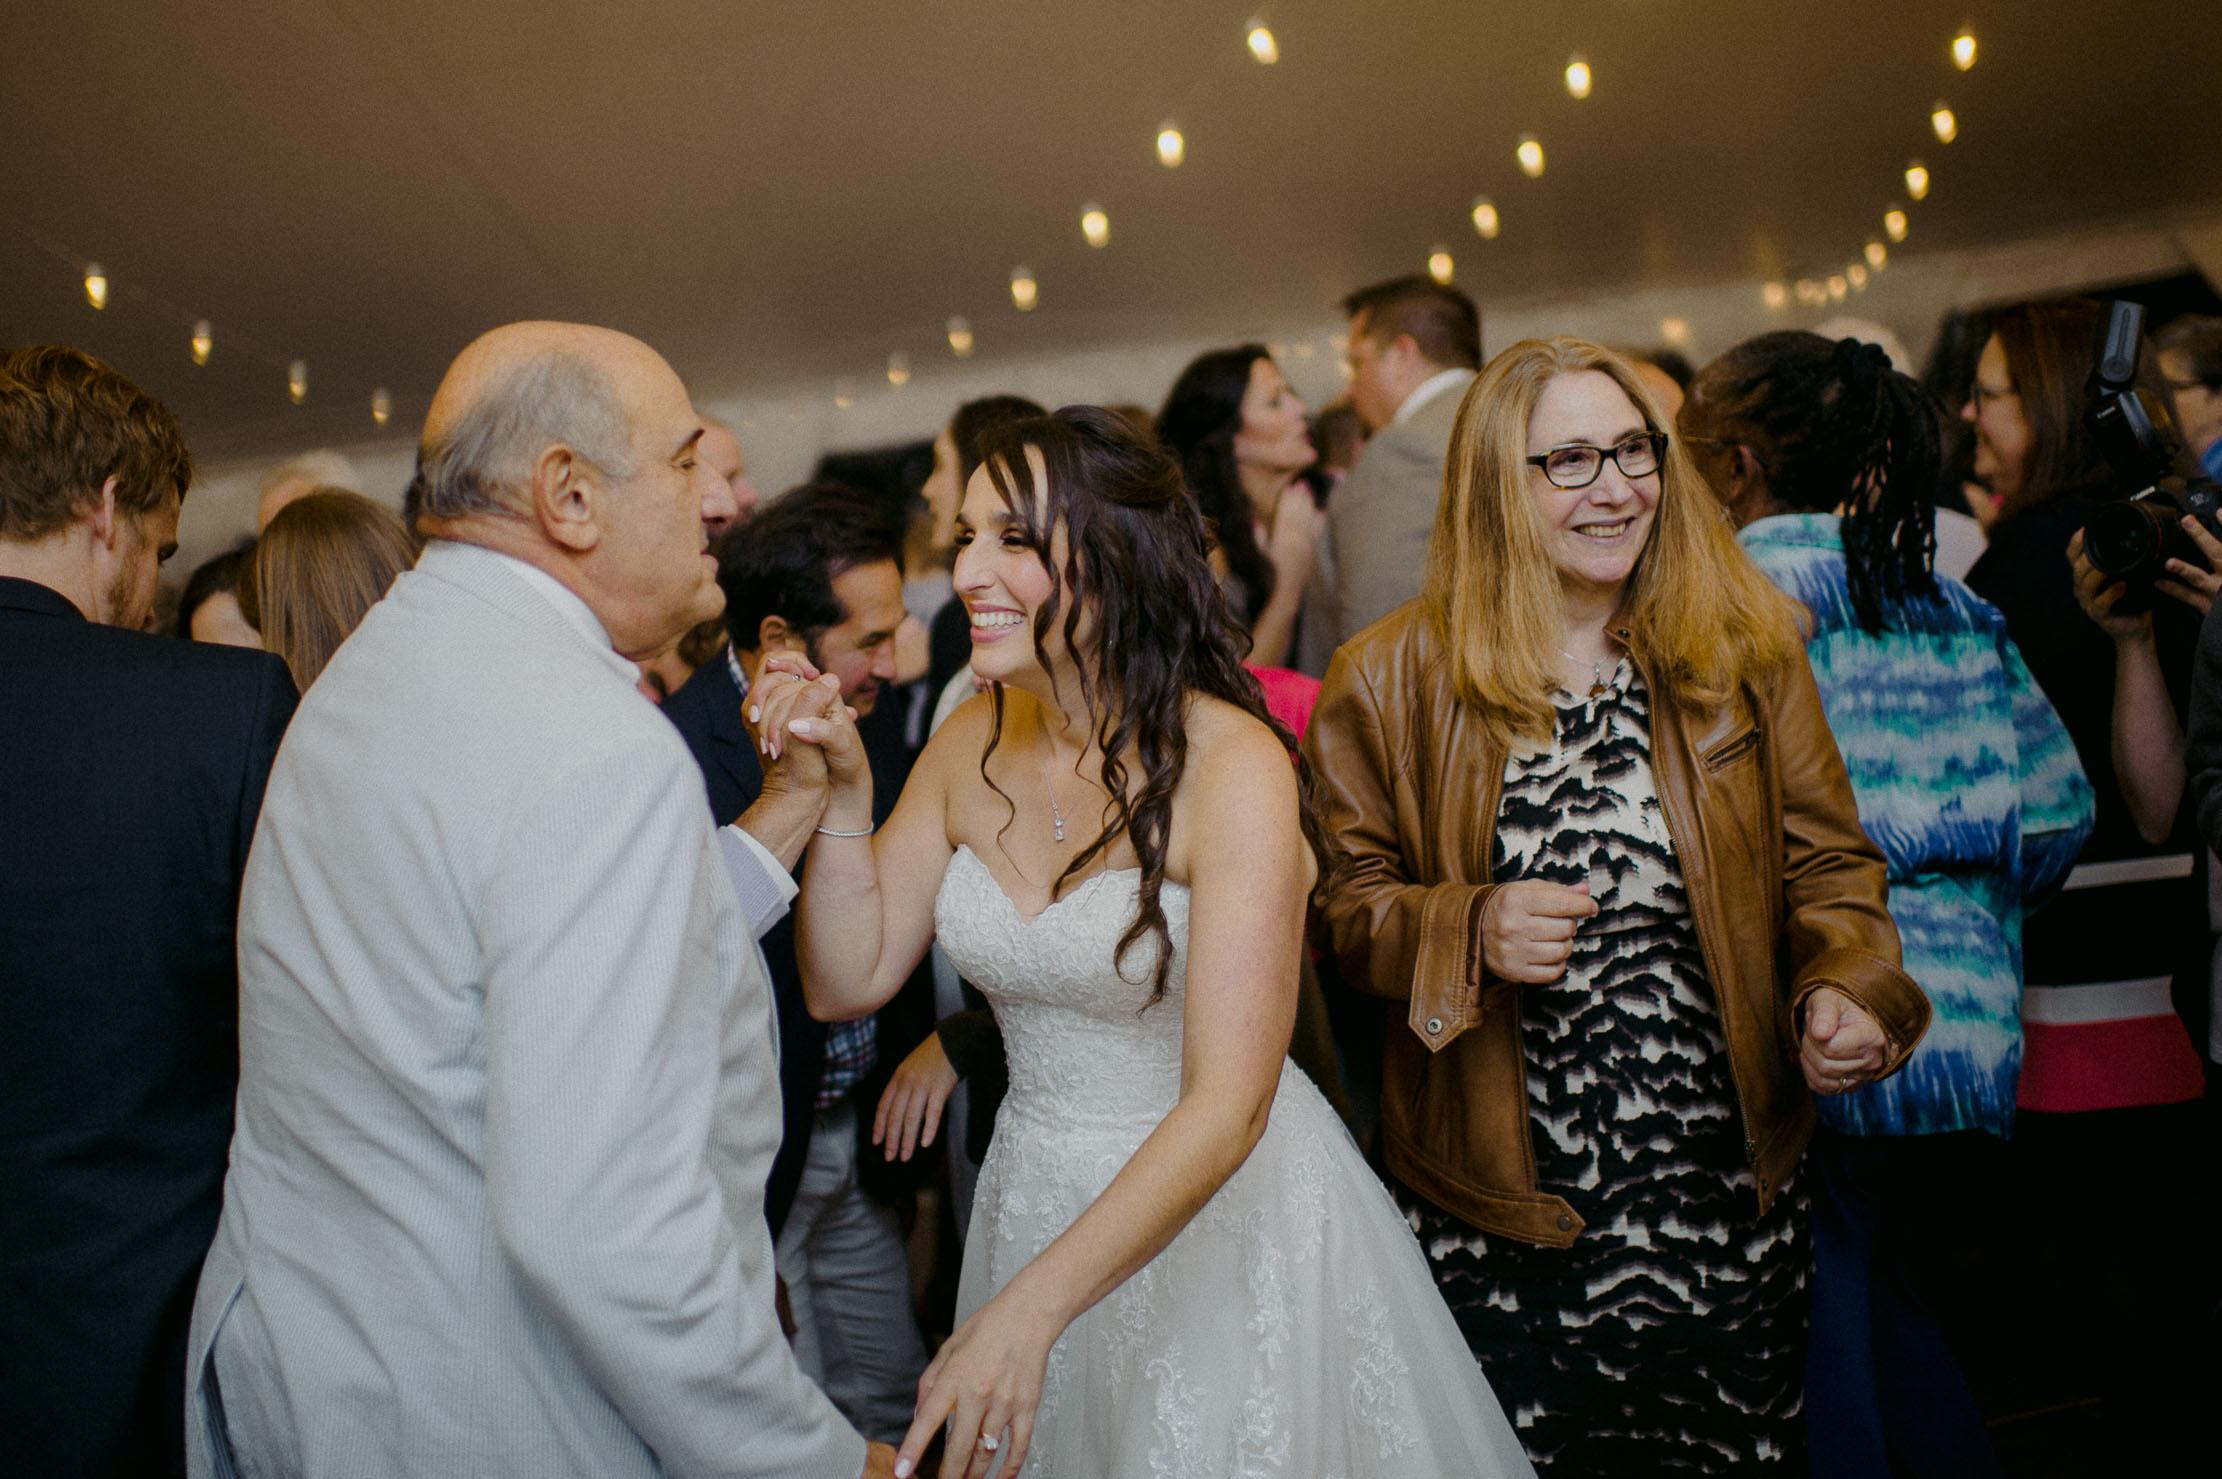 Wings-Castle-Millbrook-NY-Upstate-Wedding-Photographer-1149.jpg